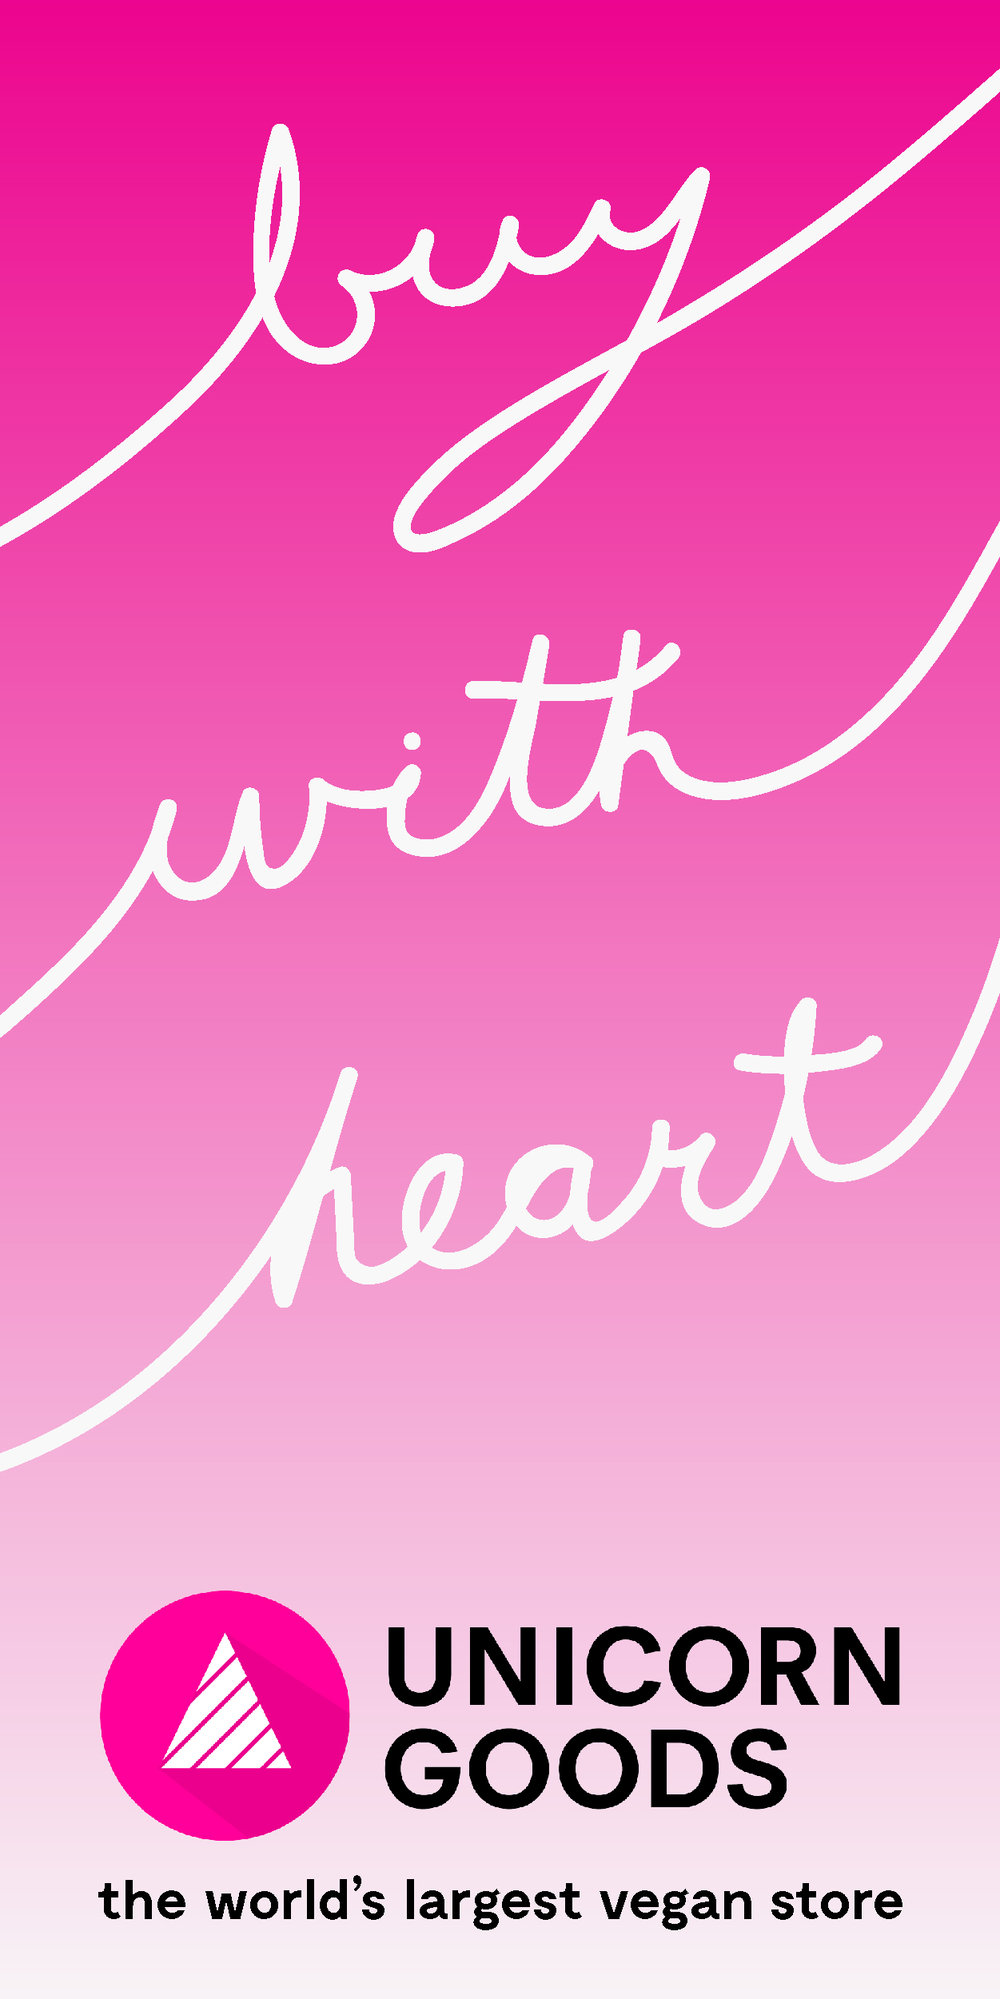 Unicorn Goods Remarketing Ads - Buy With Heart_300 x 600 Half-Page Ad copy 6.jpg